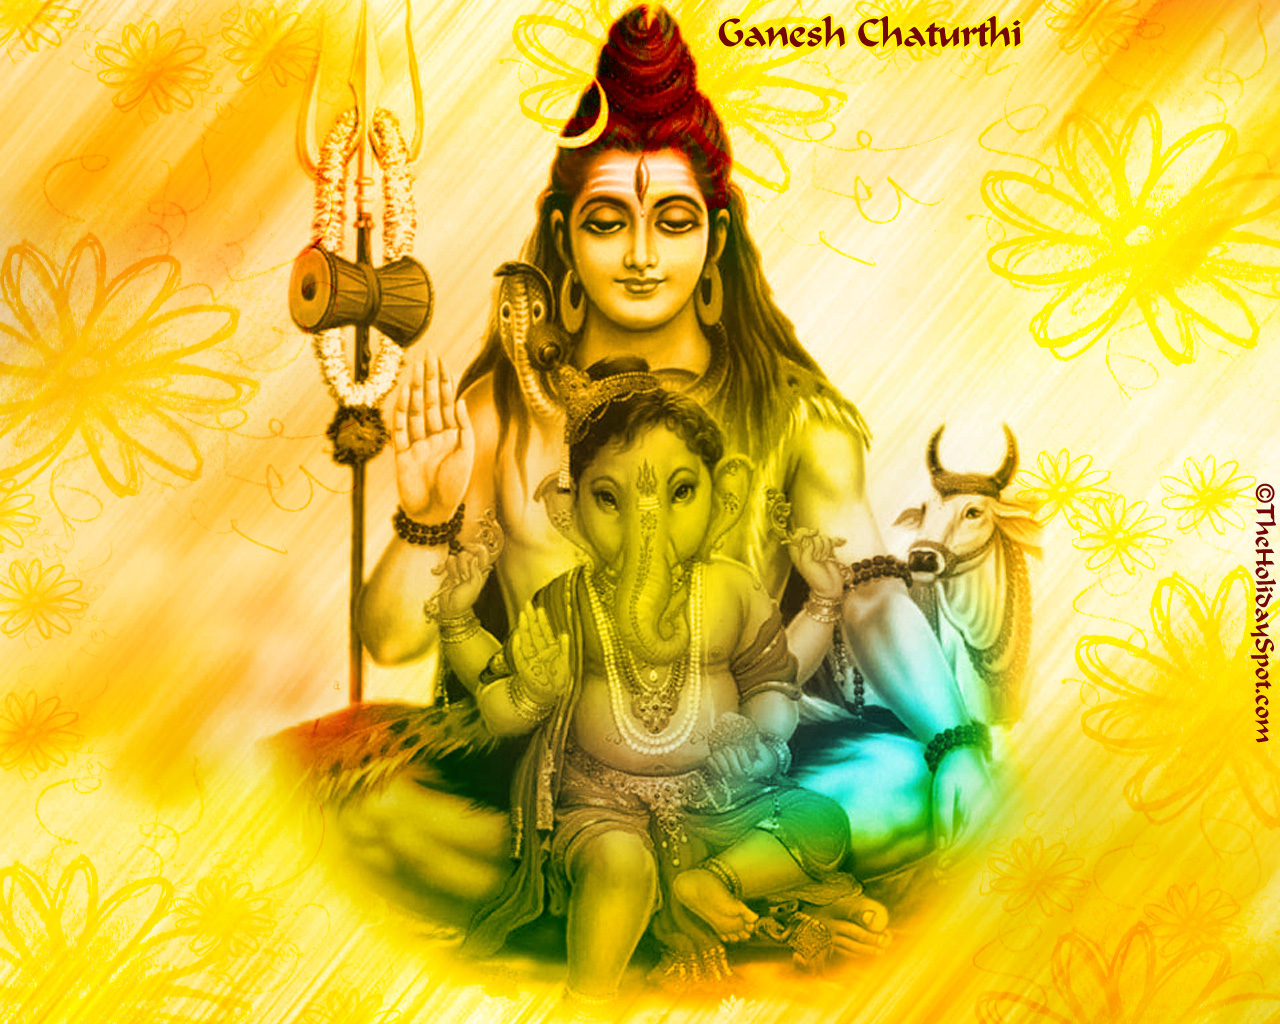 Ganesh Chaturthi Wallpapers Hd Lord Ganesha Wallpapers